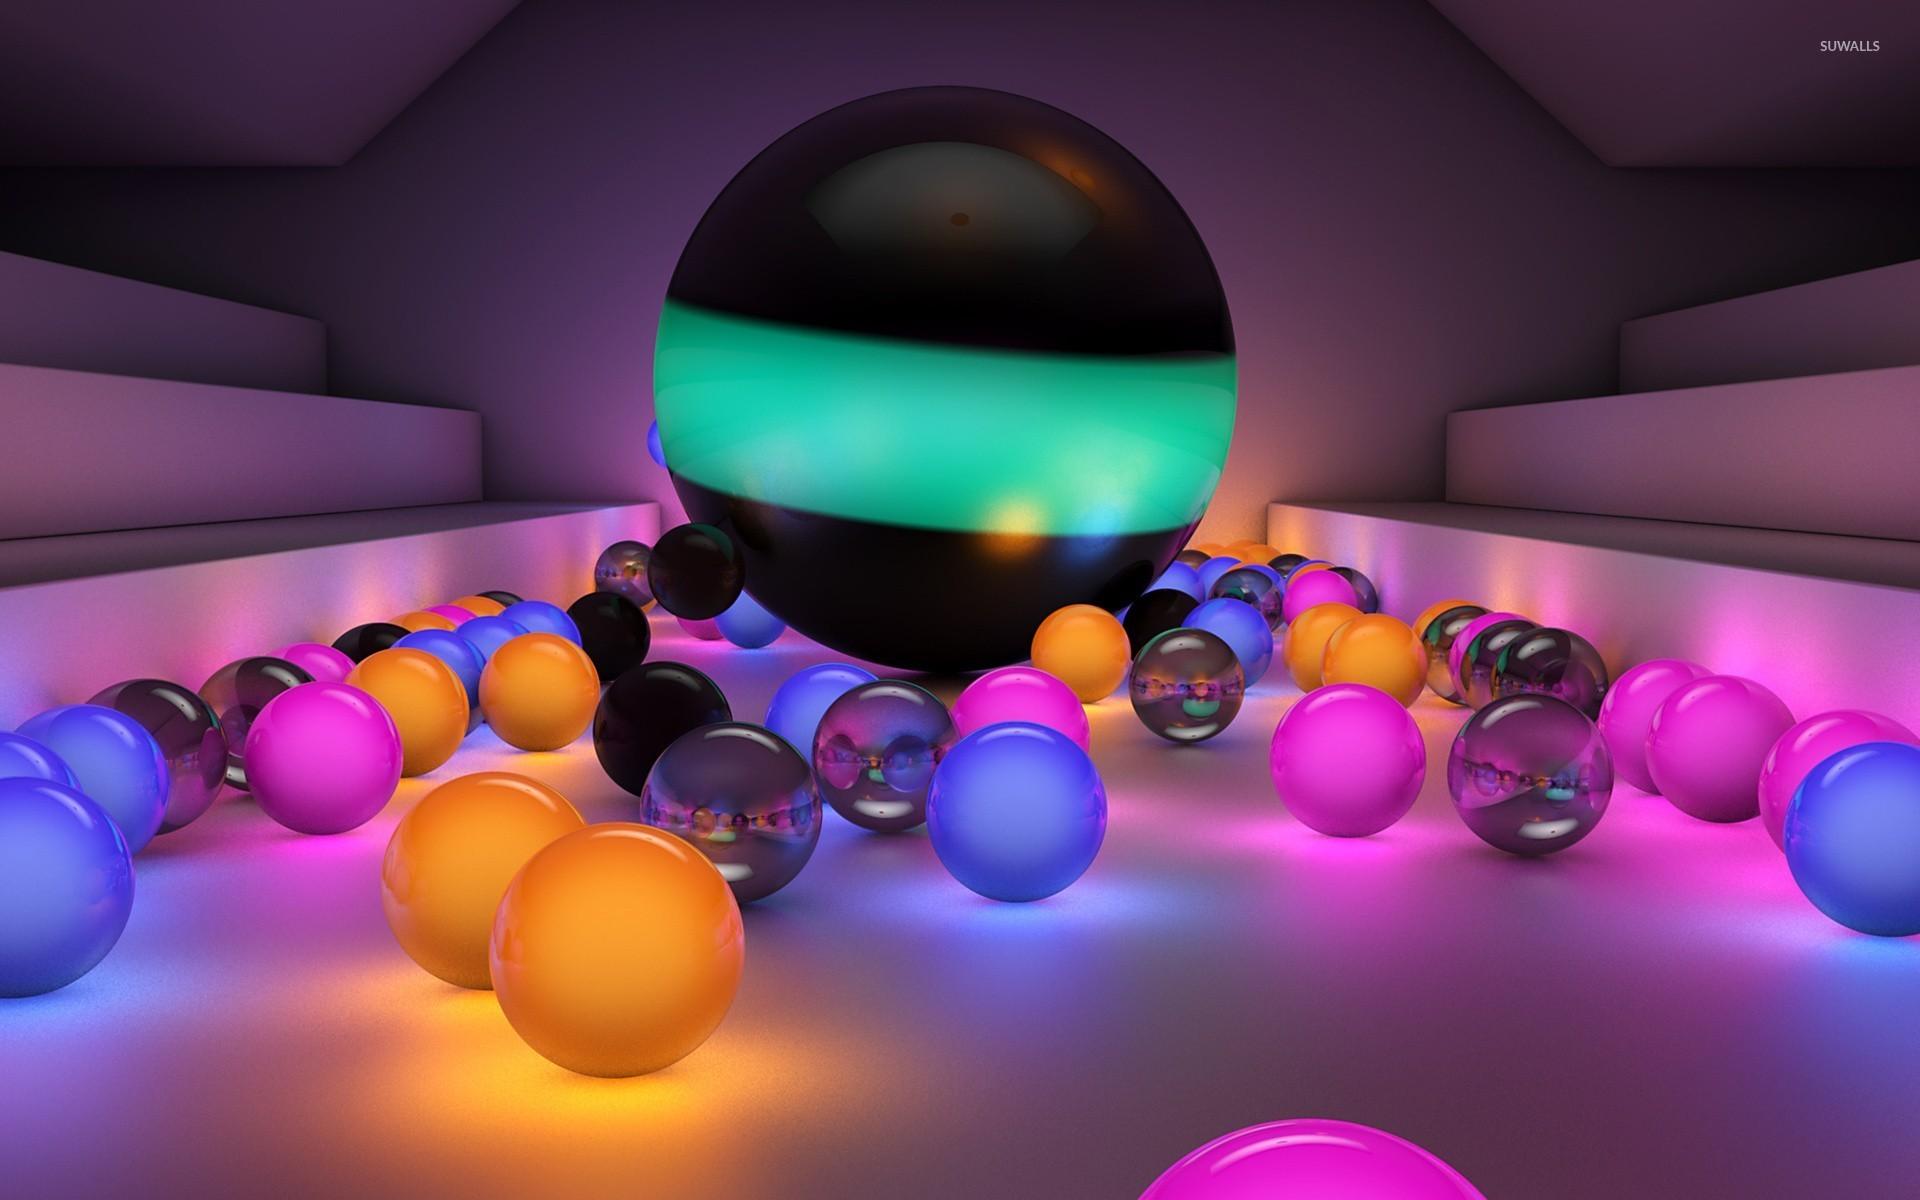 Simple Wallpaper Marble Colorful - glowing-marbles-24820-1920x1200  Snapshot_74415.jpg